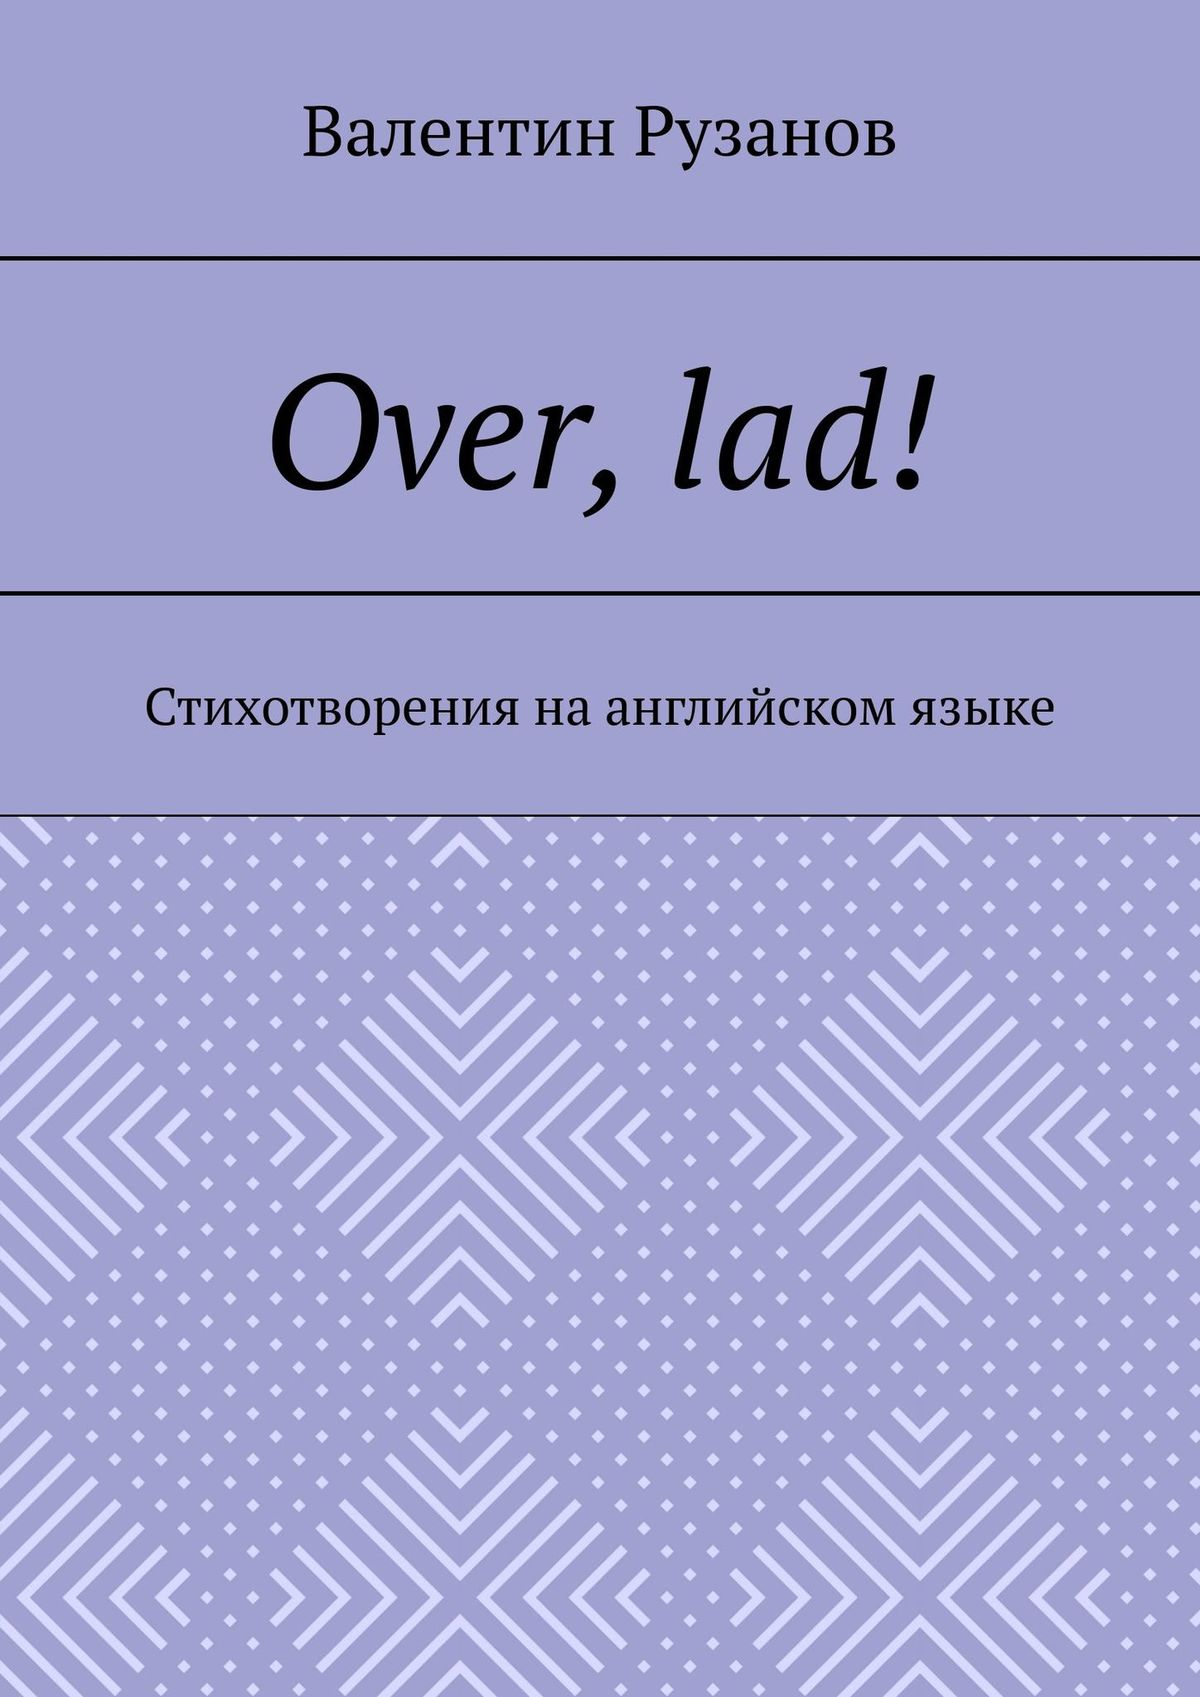 Валентин Рузанов Over, lad! Стихотворения наанглийском языке i m glad i did